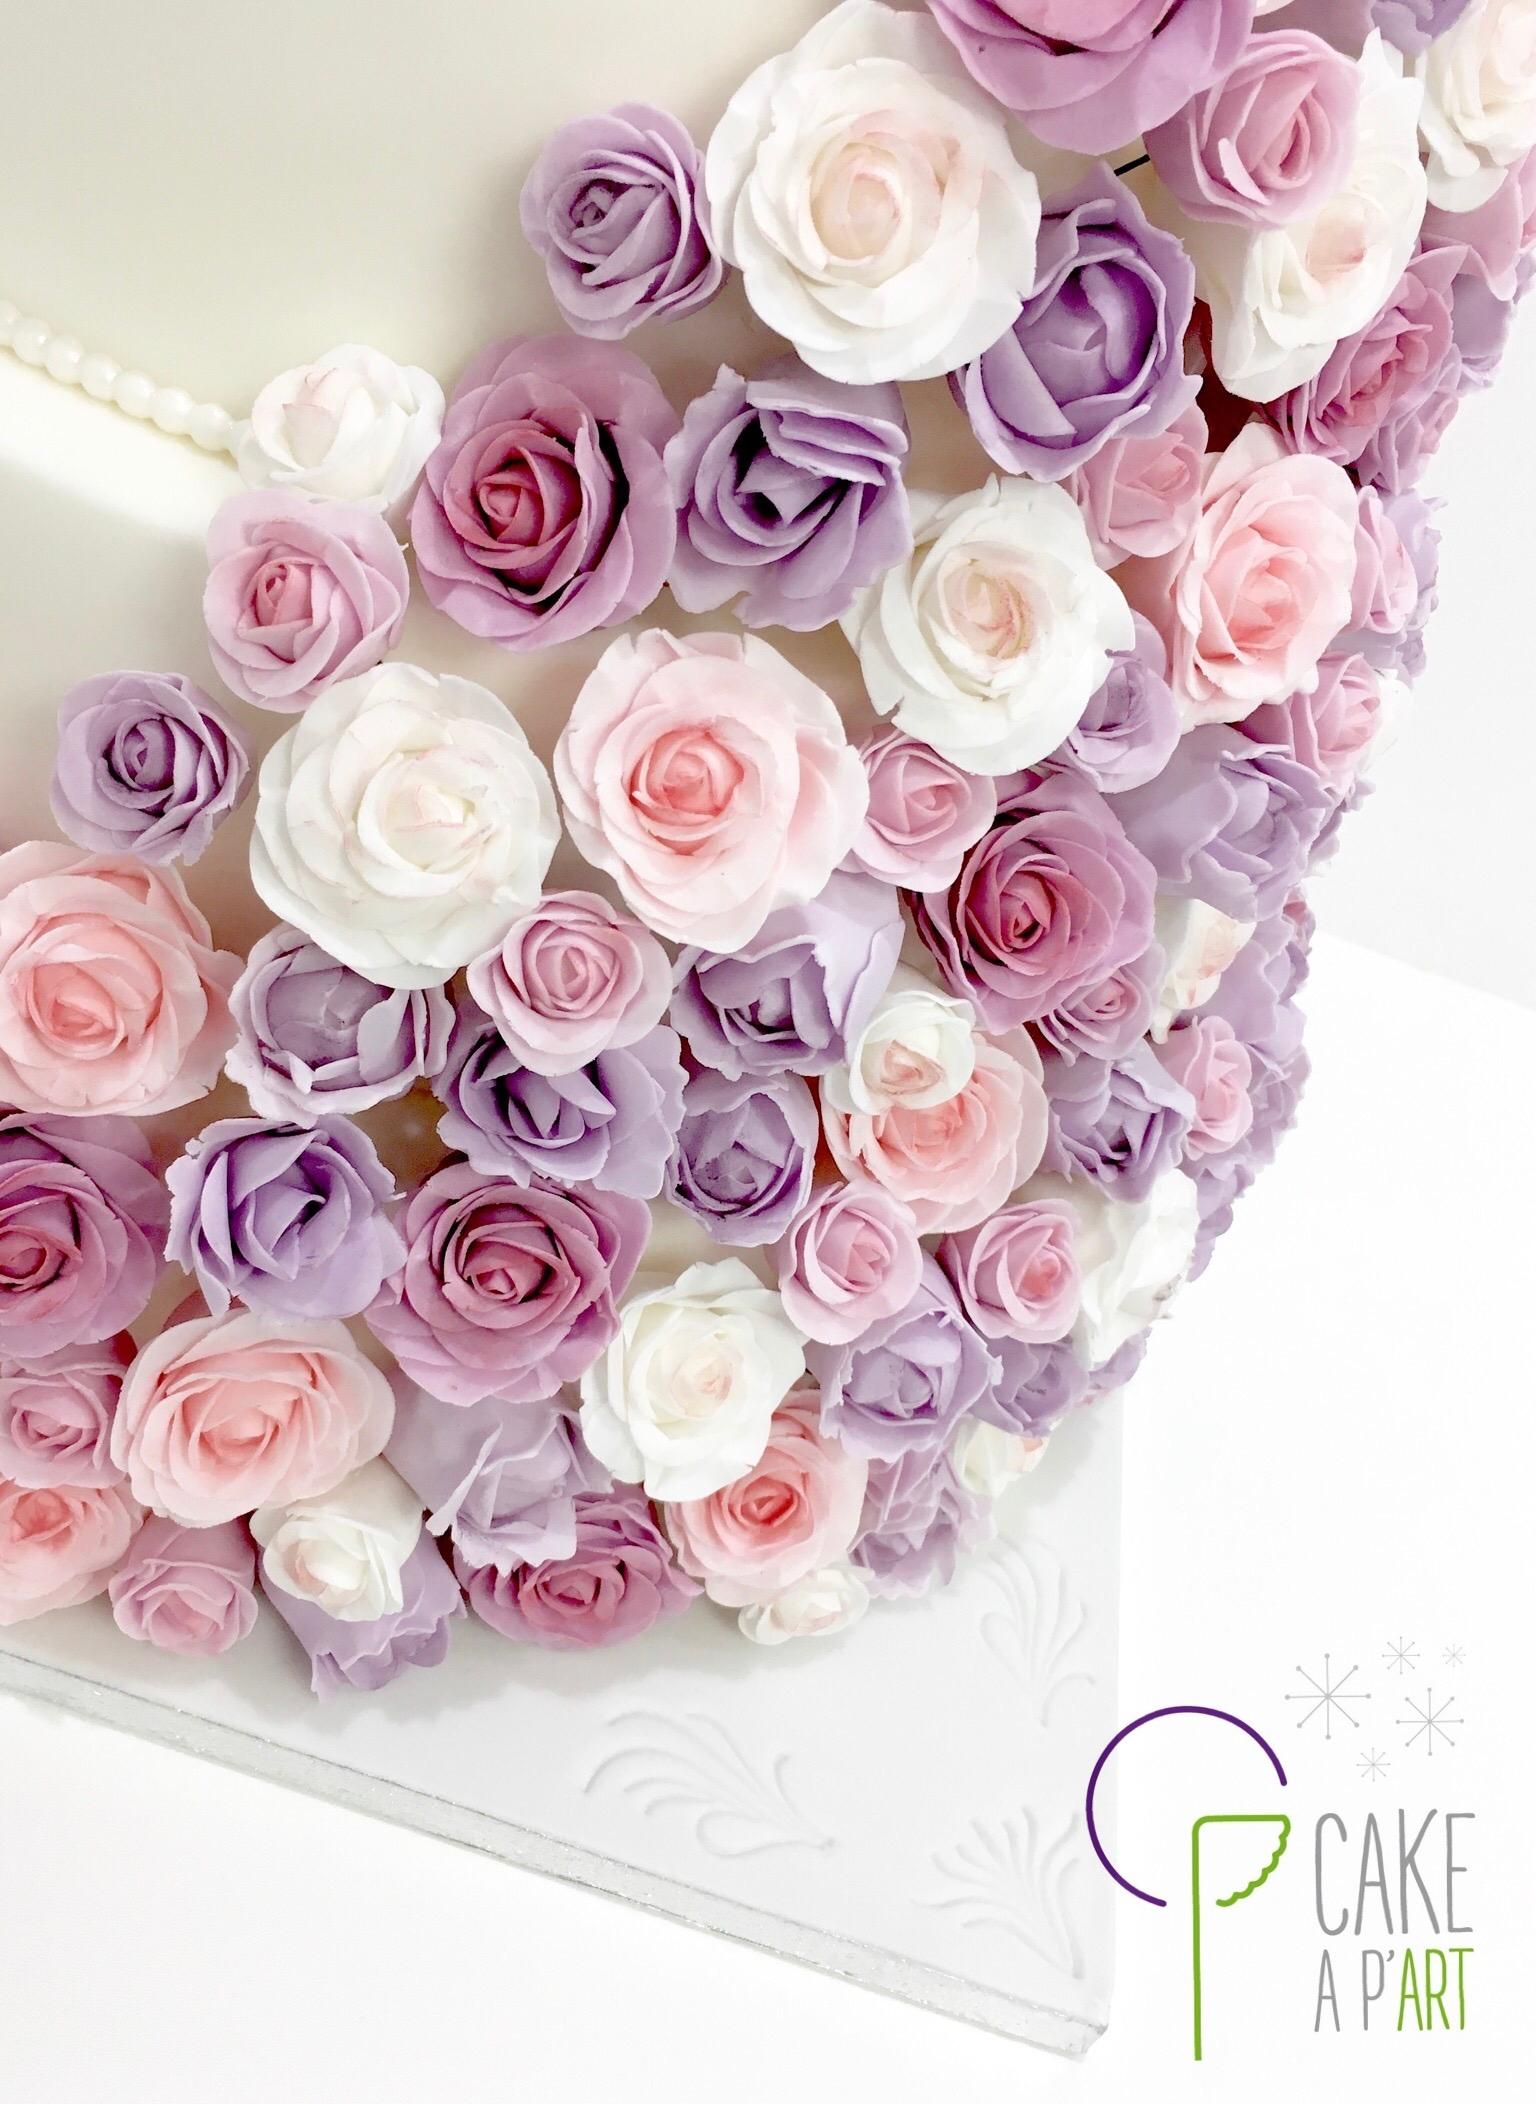 Wedding Cake Pièce montée Mariage - Thème Cascade de fleurs Roses et tulipes